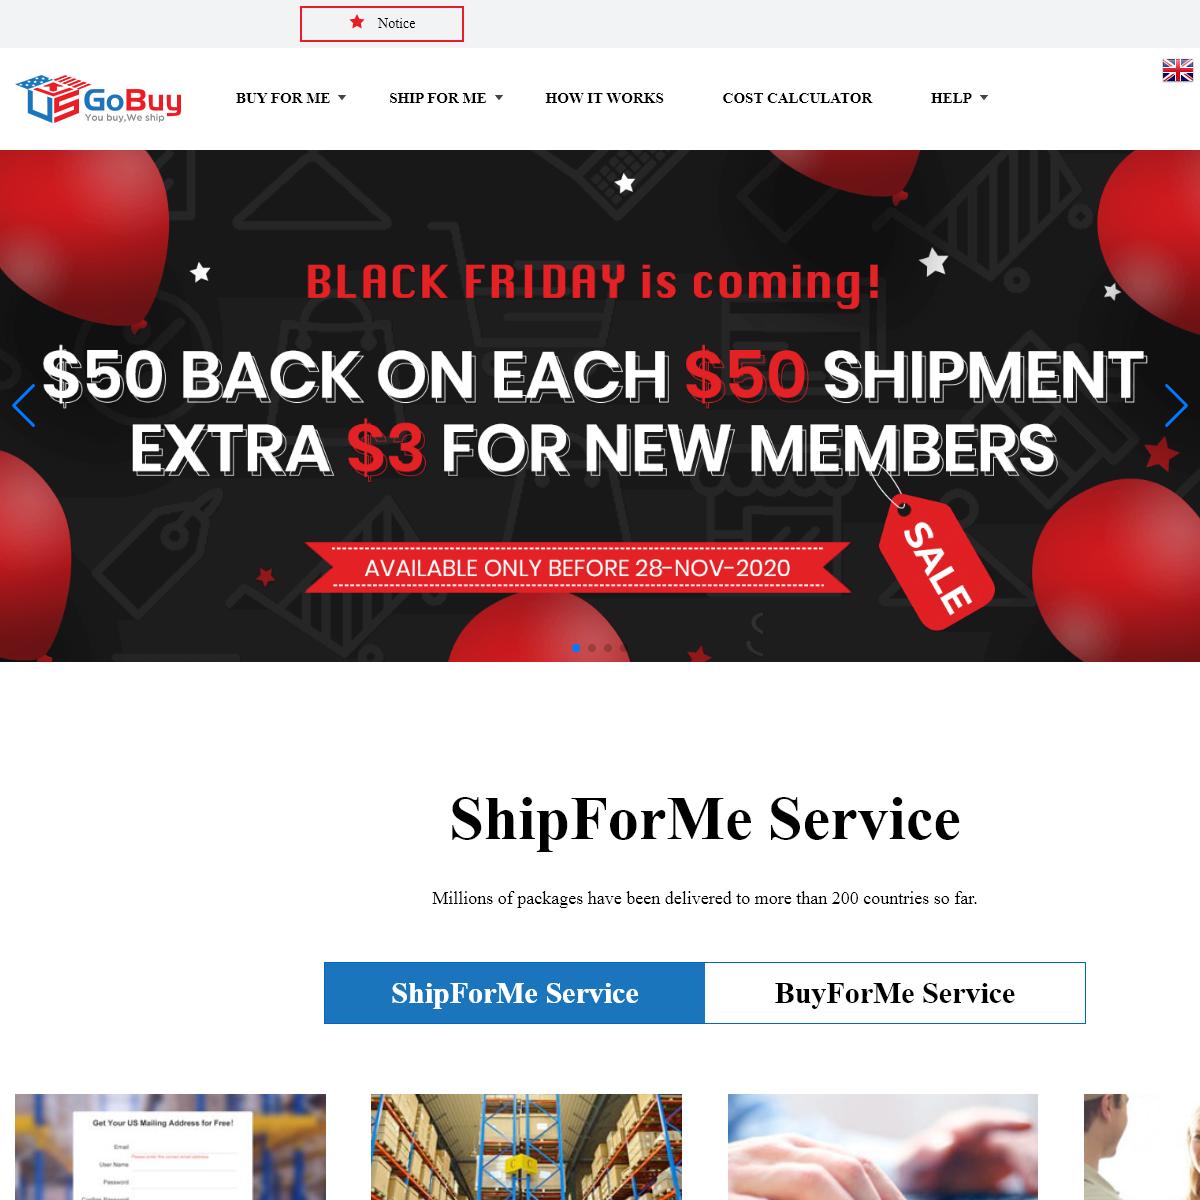 Package & Mail Forwarding Service for US Online Shopping - USGoBuy